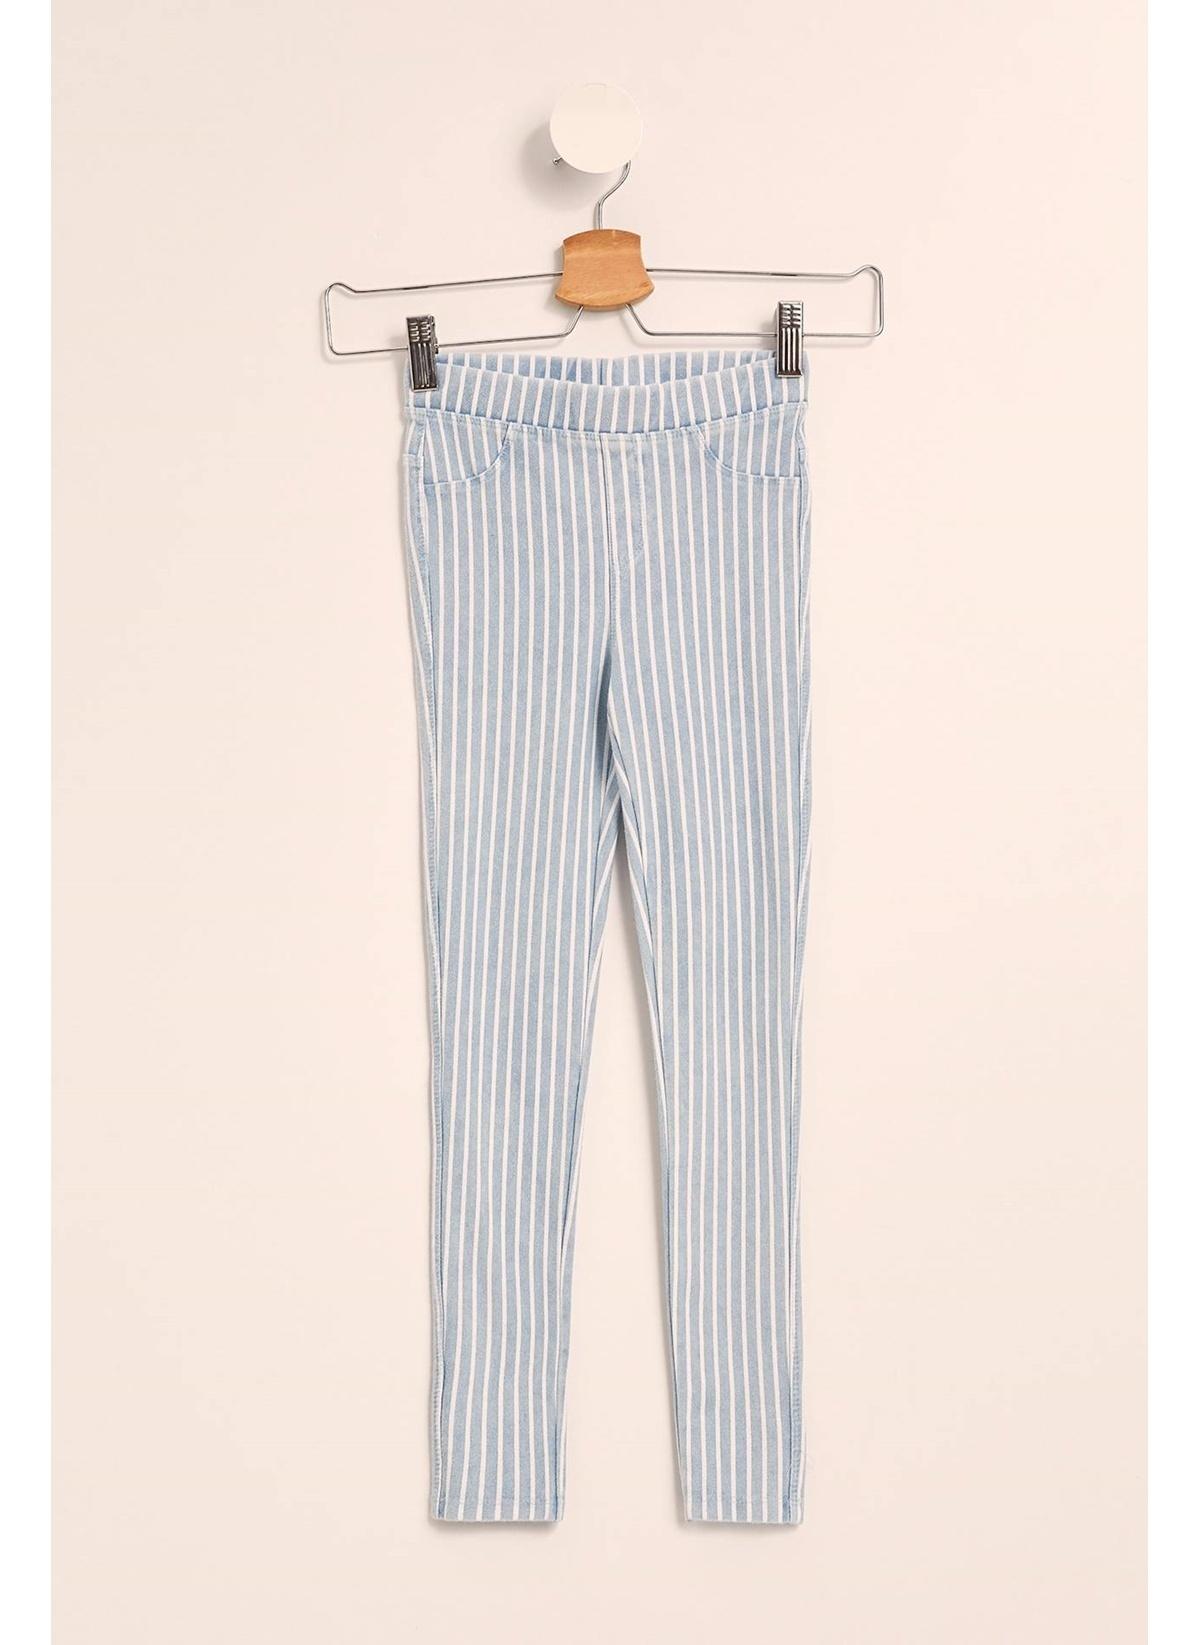 Defacto Pantolon K8150a619spbe1 Elastik Belli Slim Fit Çi – 35.99 TL